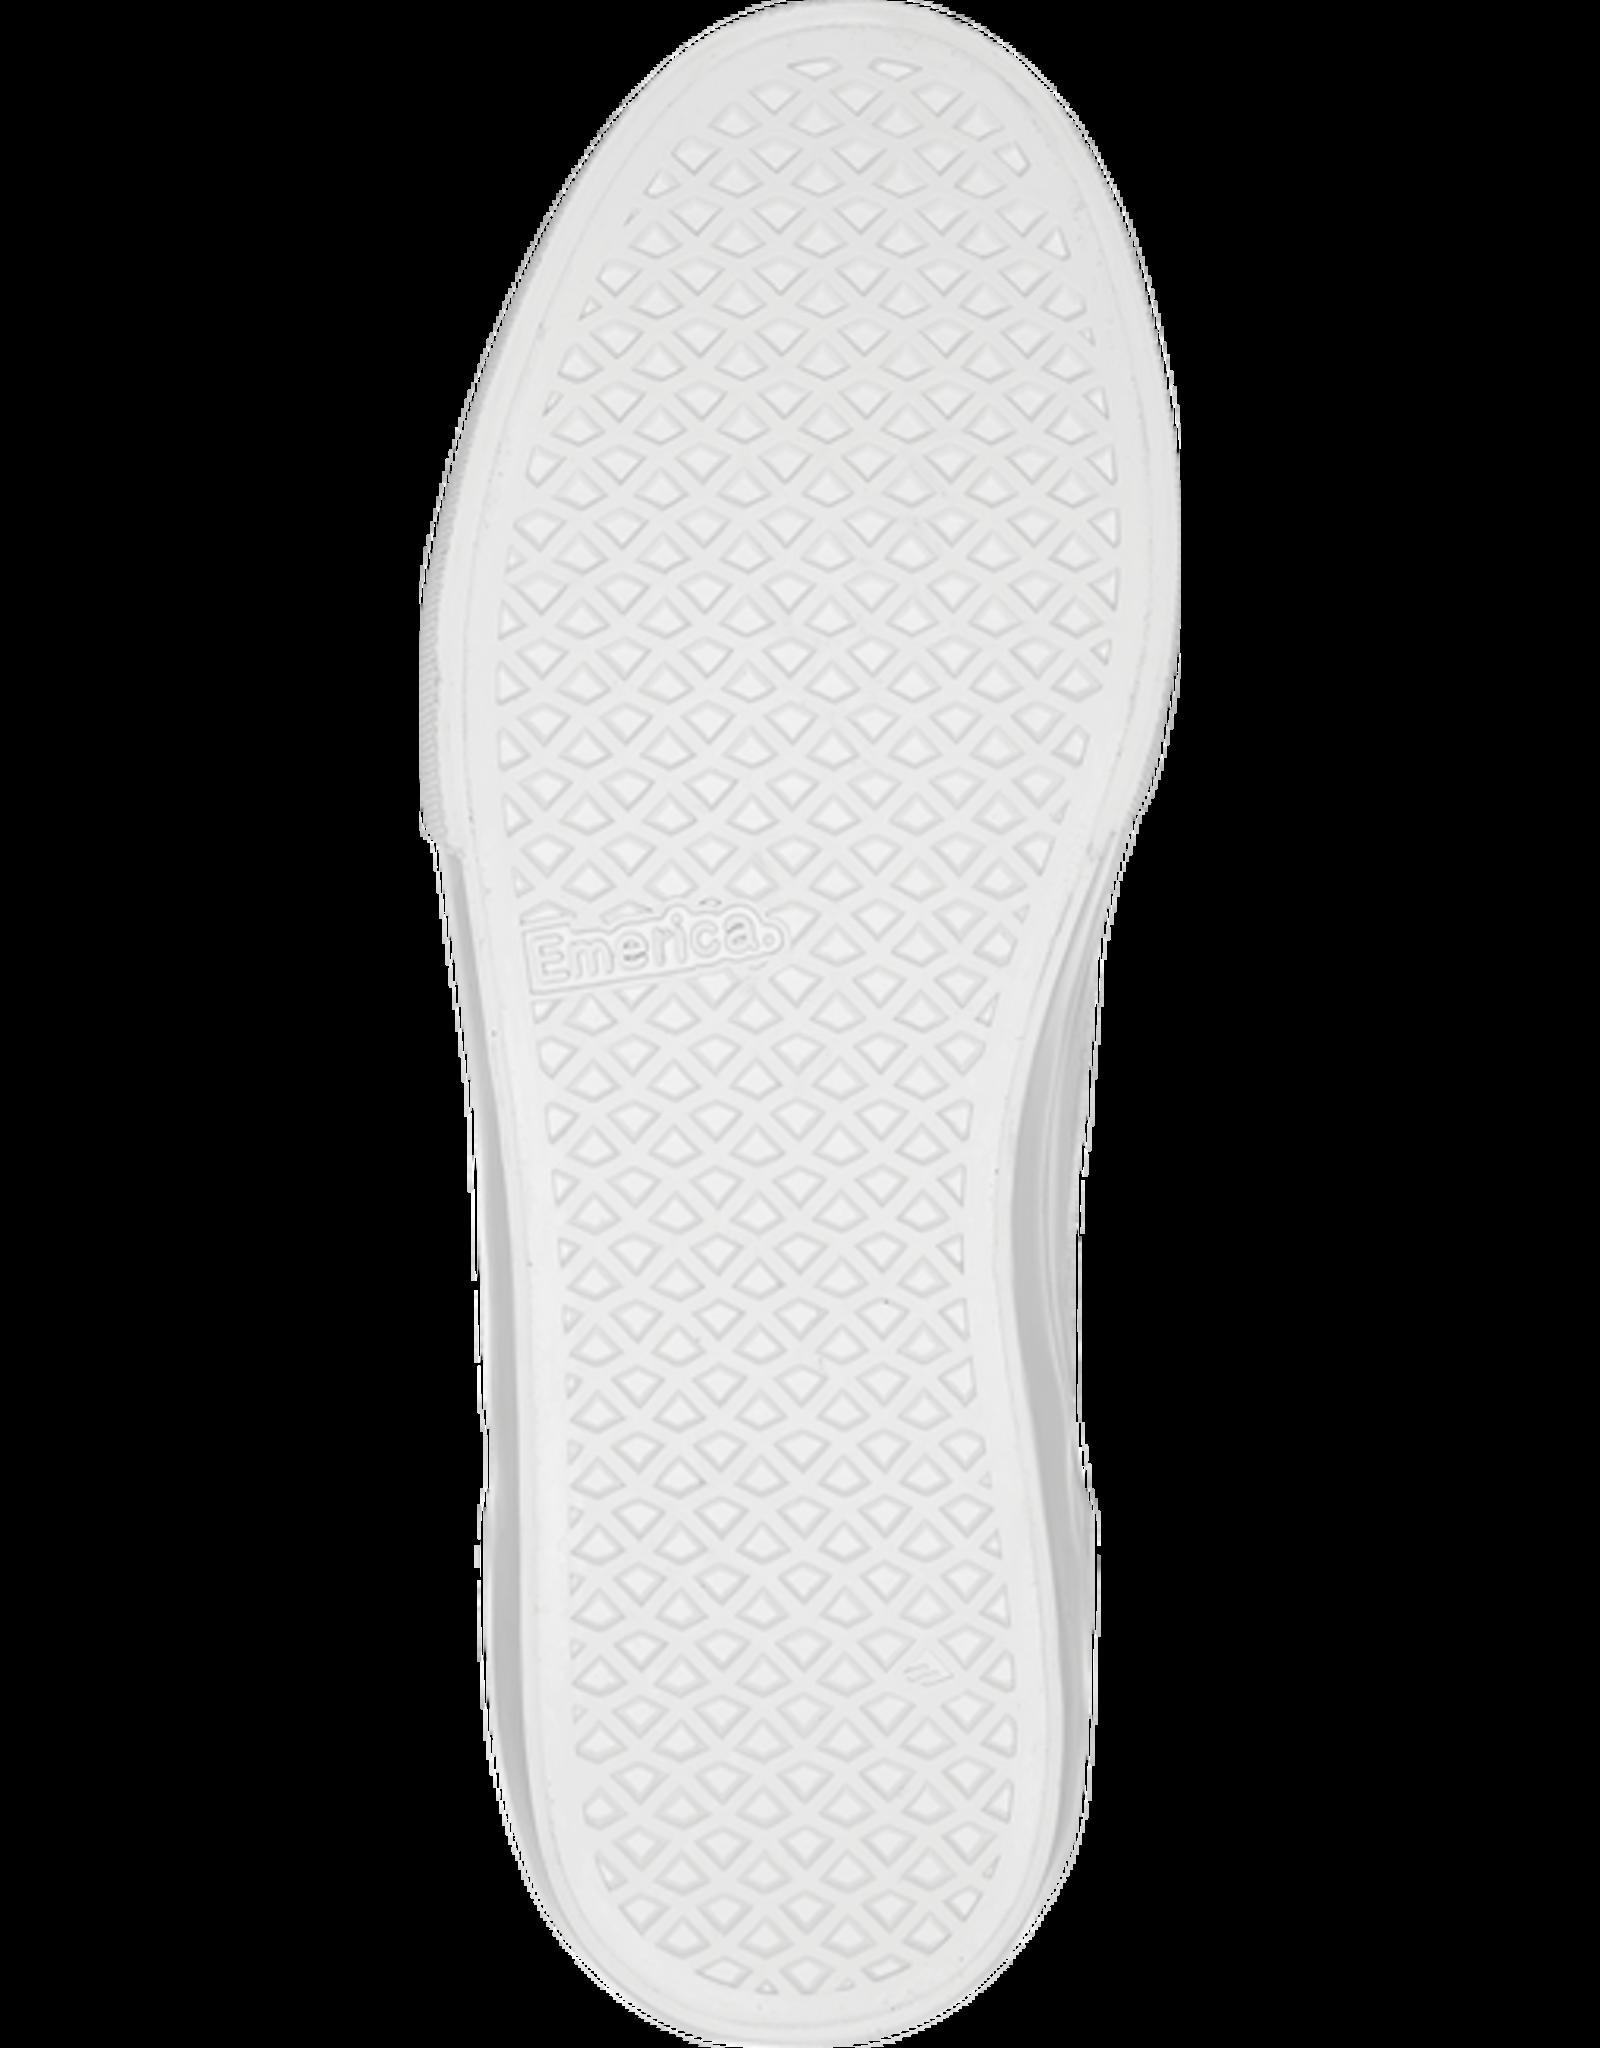 emerica Emerica - Soulier homme Wino g6 slip-on white/print